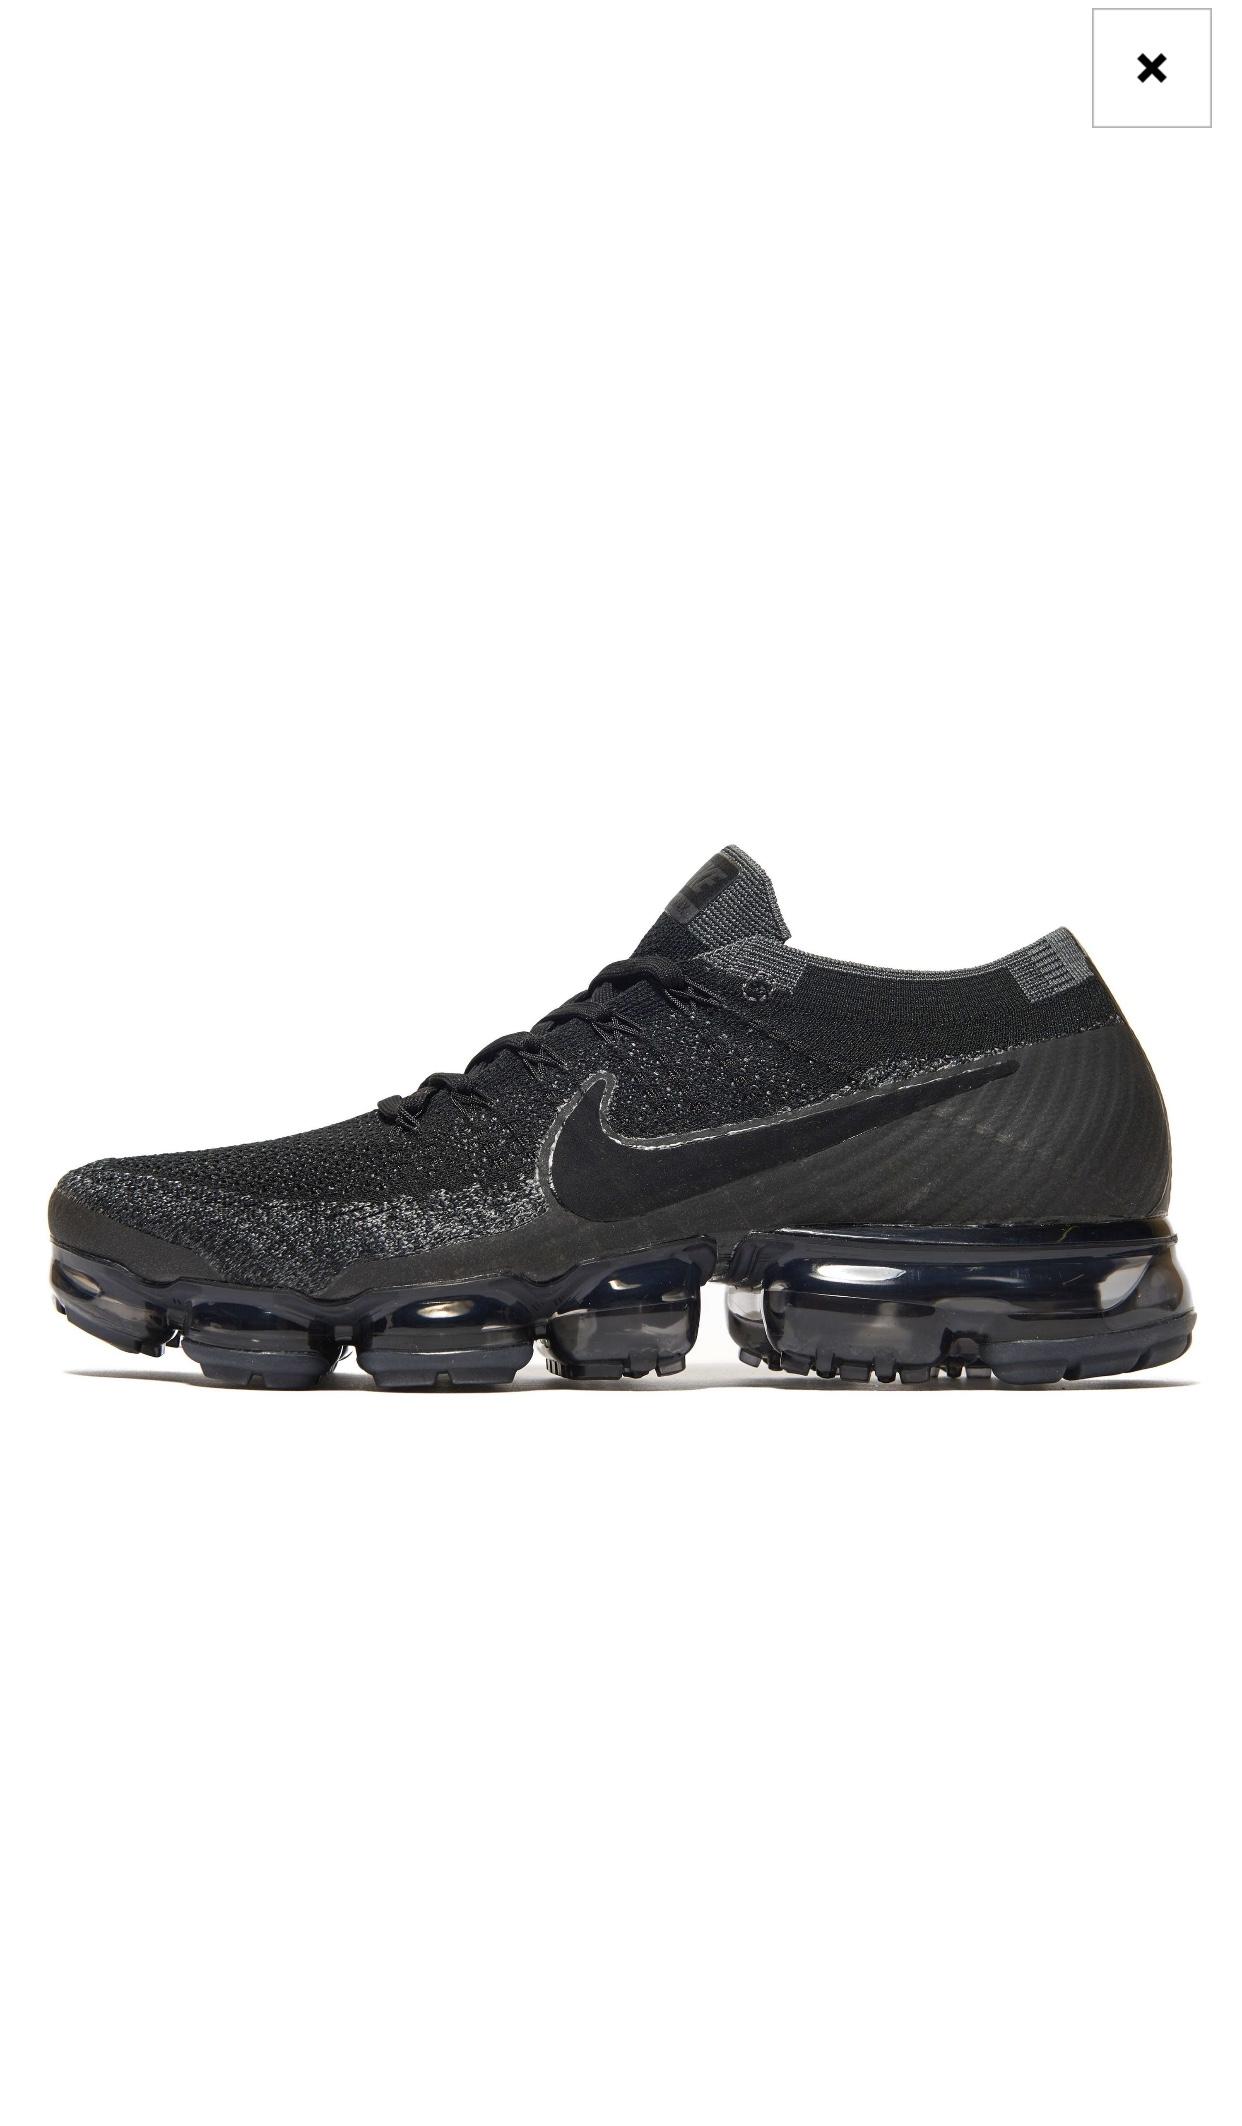 competitive price de8cd e2fb5 151° - Nike Air Vapormax FlyKnit Black Mens Online JDSports ...